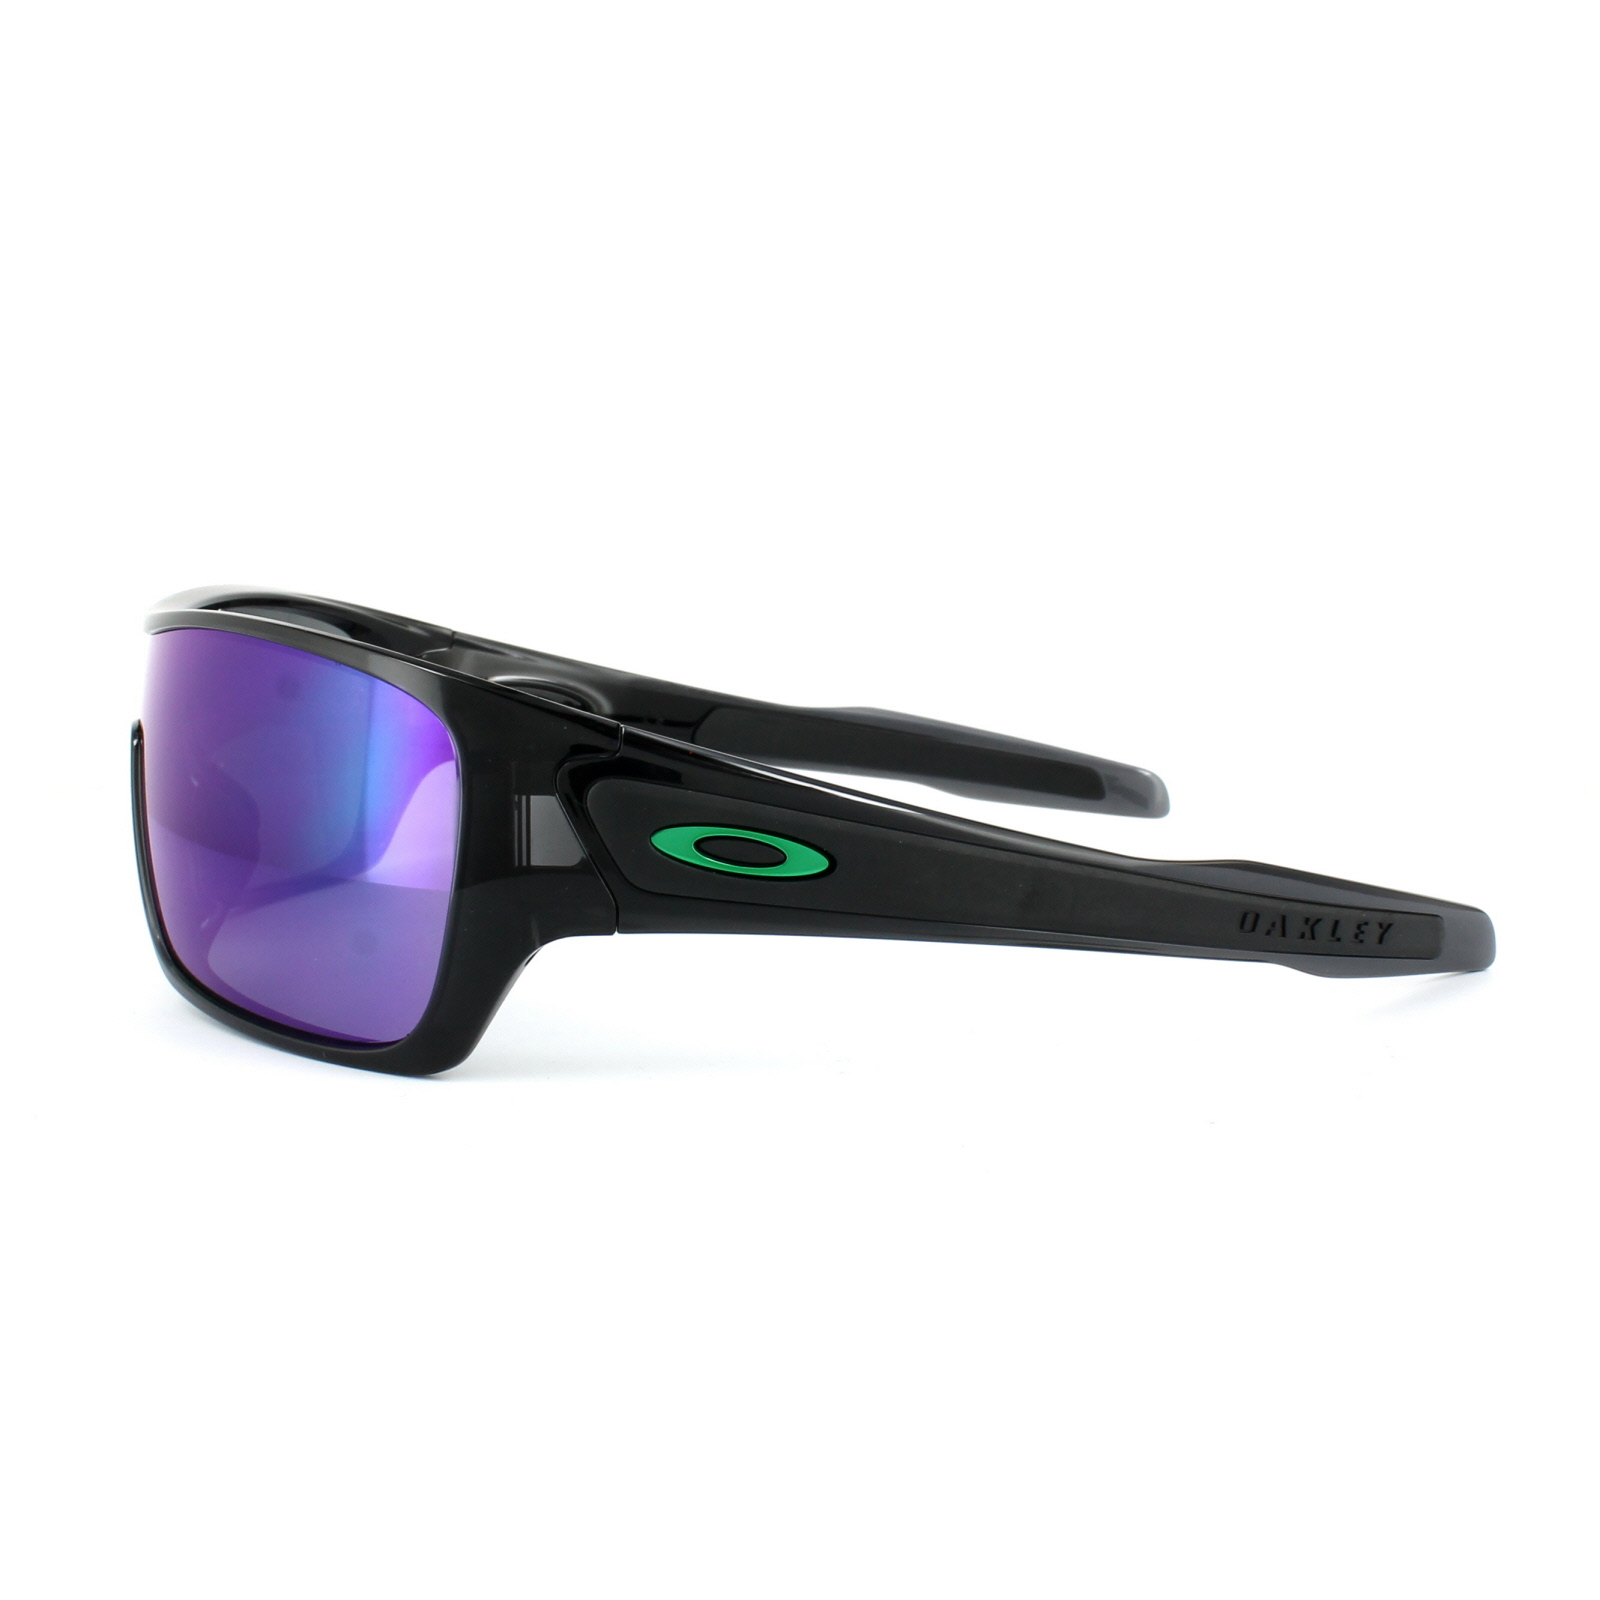 37023fec0b Cheap Oakley Turbine Rotor Sunglasses - Discounted Sunglasses